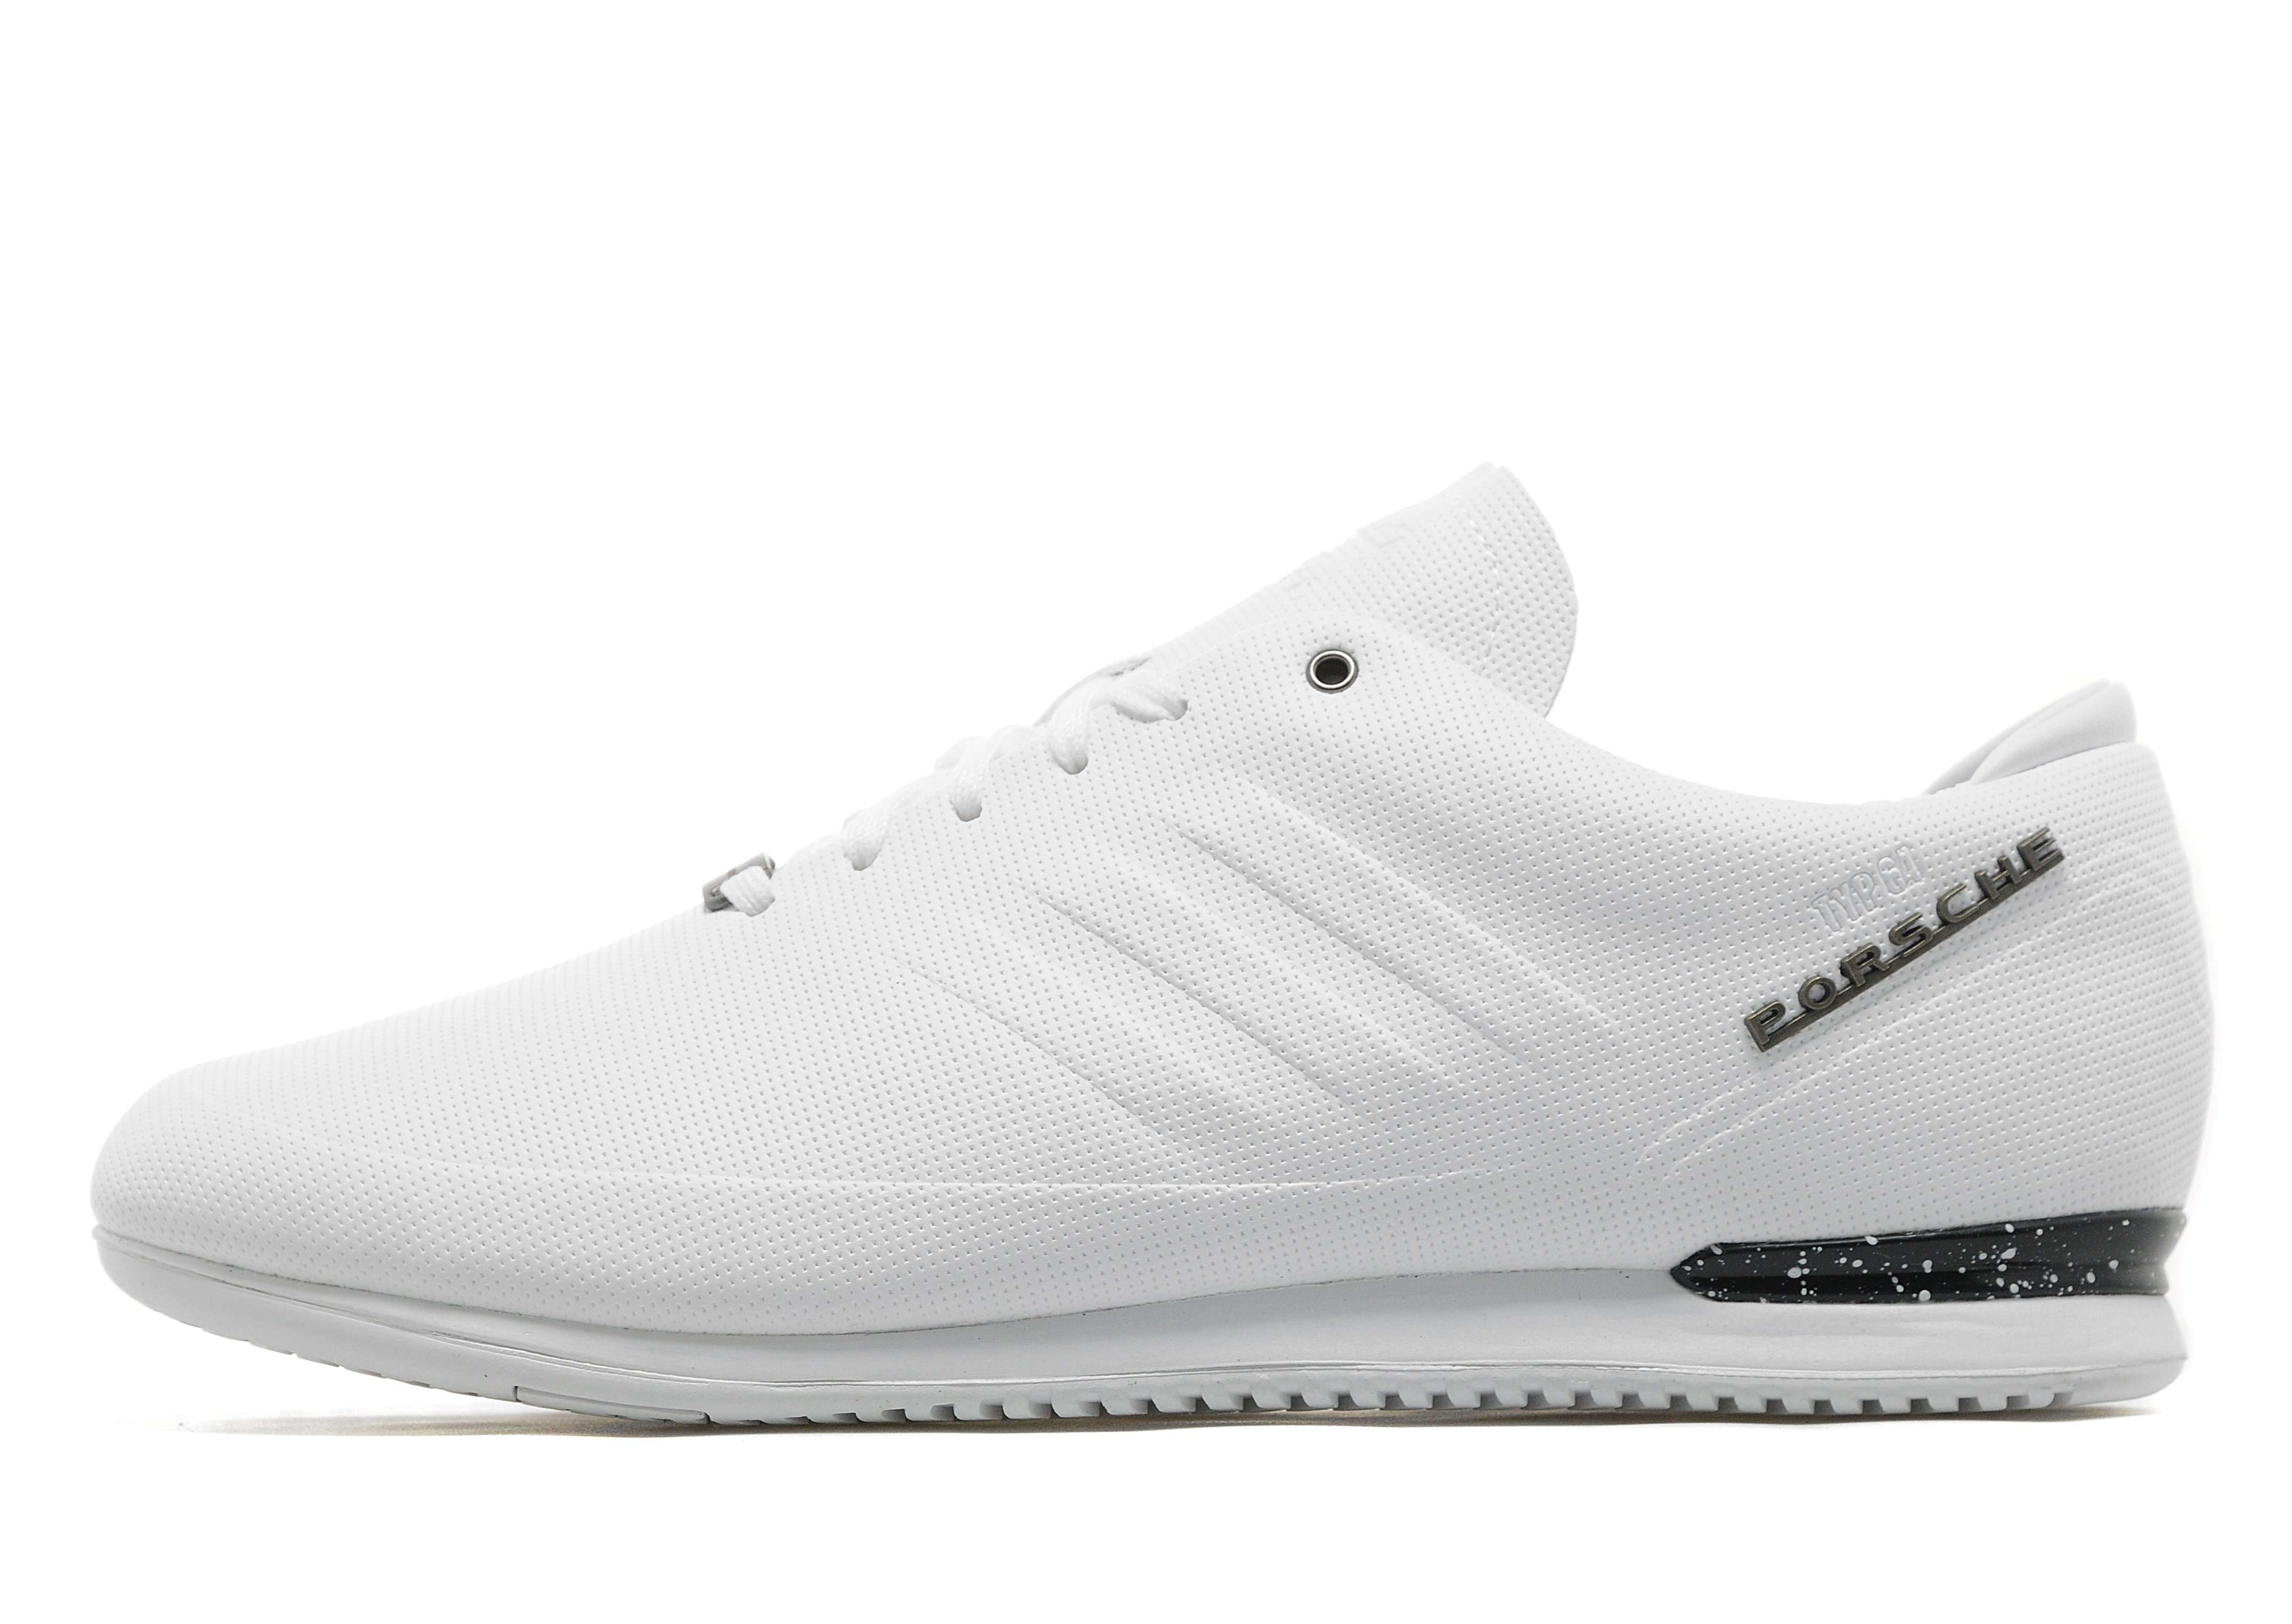 super quality 100% high quality run shoes adidas porsche typ 64 white